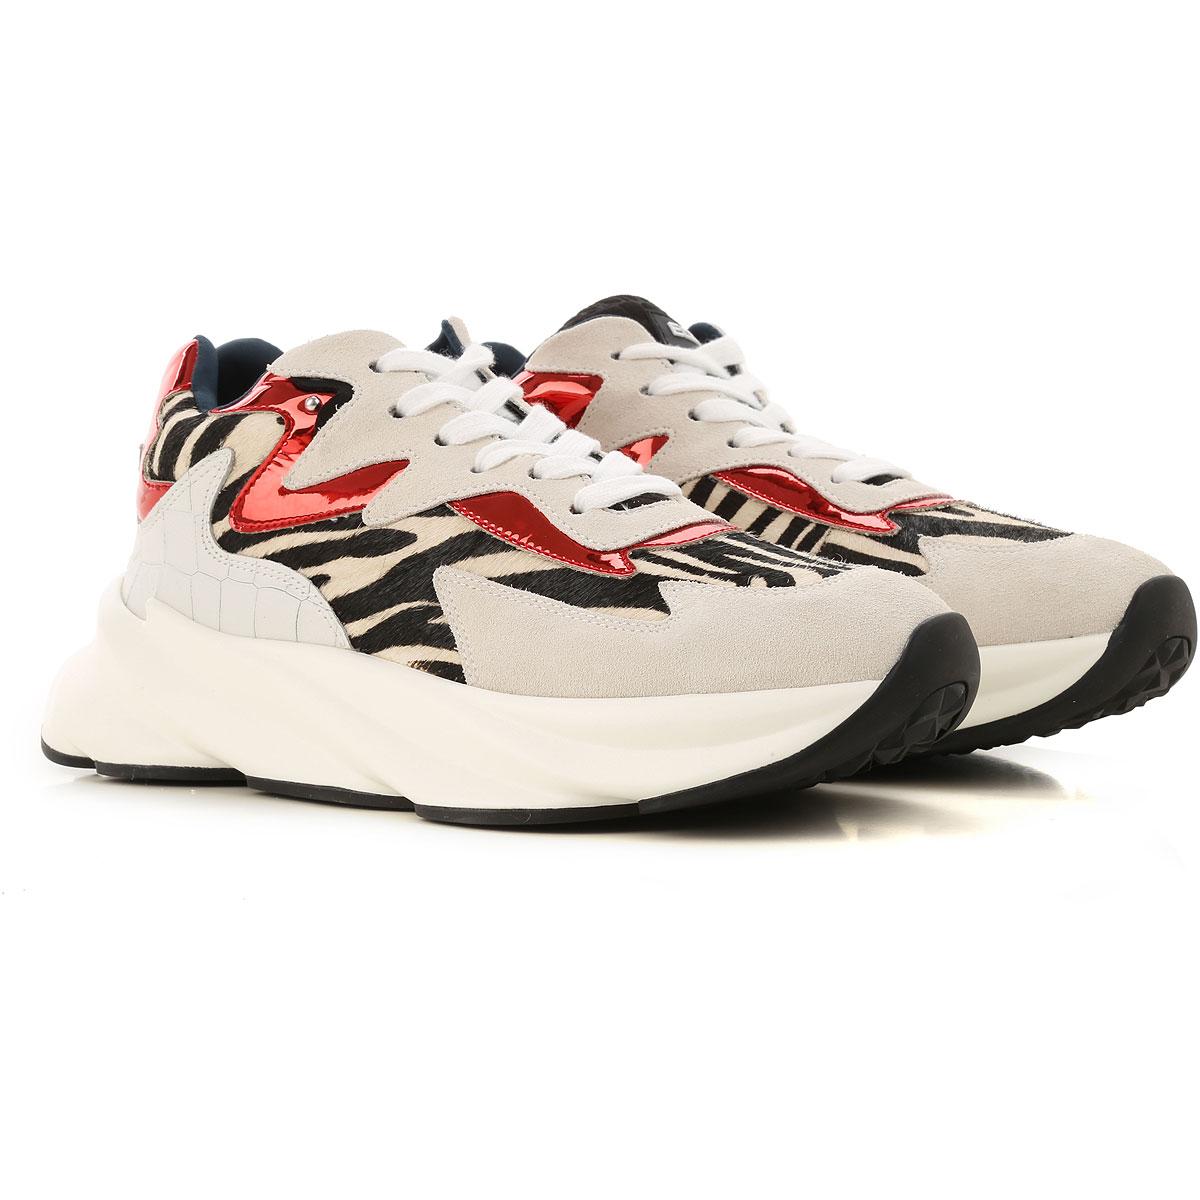 Elena Iachi Sneakers for Women On Sale, Zebra-Striped, Leather, 2019, 10 5 6 7 8 9